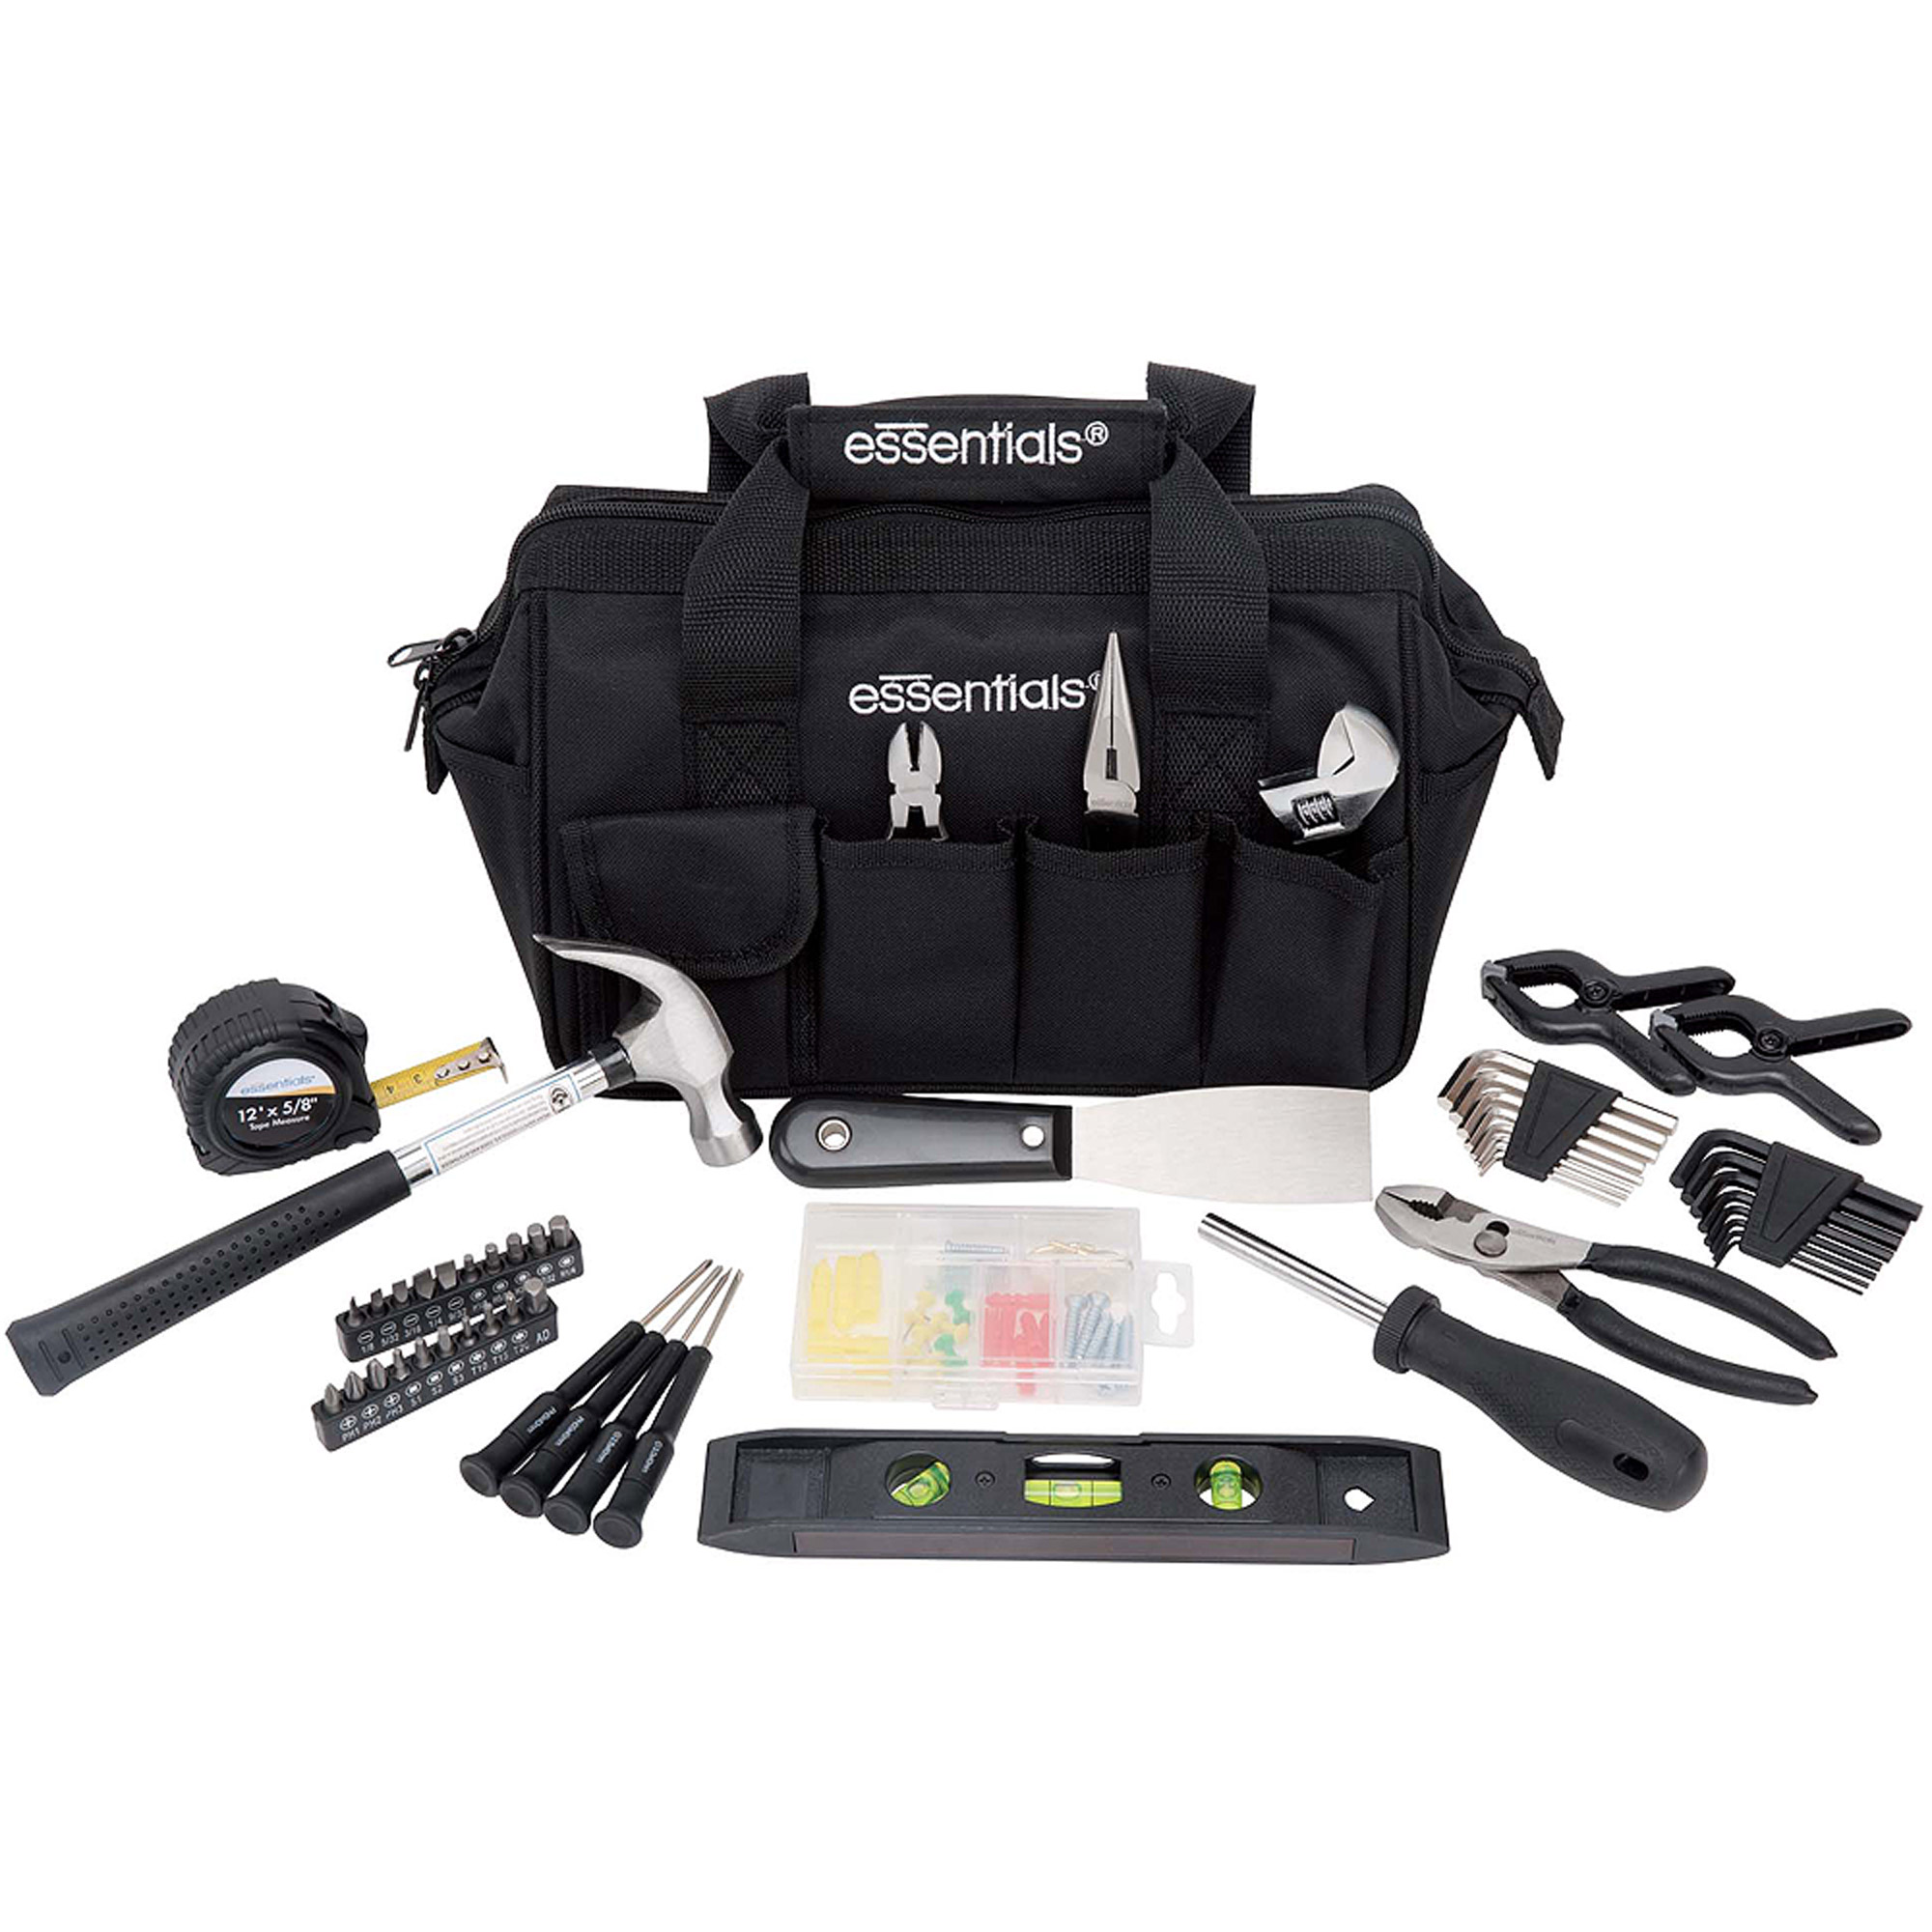 Essentials 53-Piece Around-The-House Tool Kit, Black